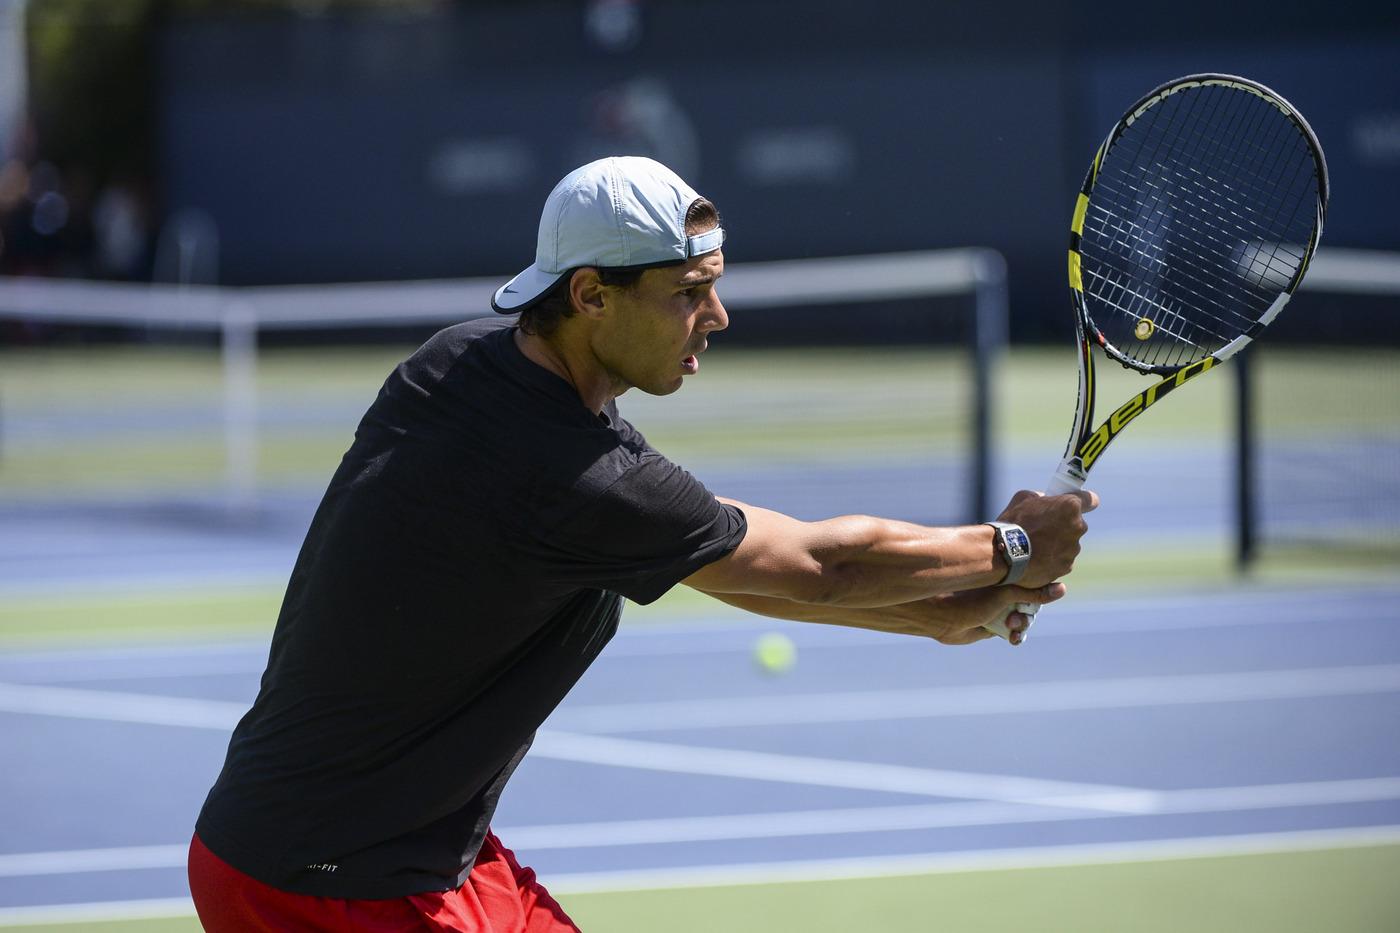 icooyテニス個別レッスンアカデミーのテニスコーチ向けサイト